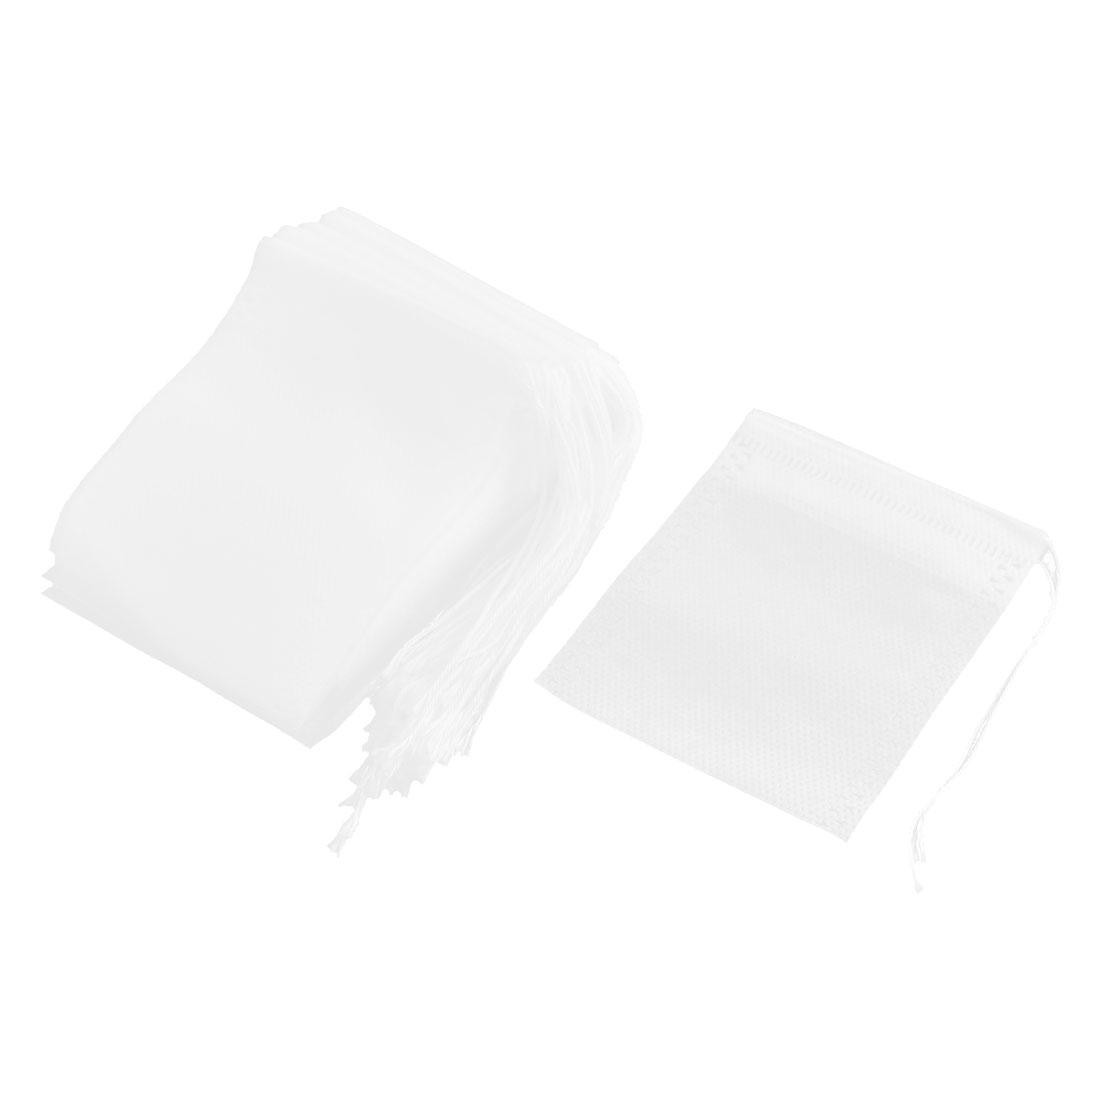 Home Non-woven Fabric Empty Powder Spice Tea Filter Bag White 9cm x 7cm 50 Pcs